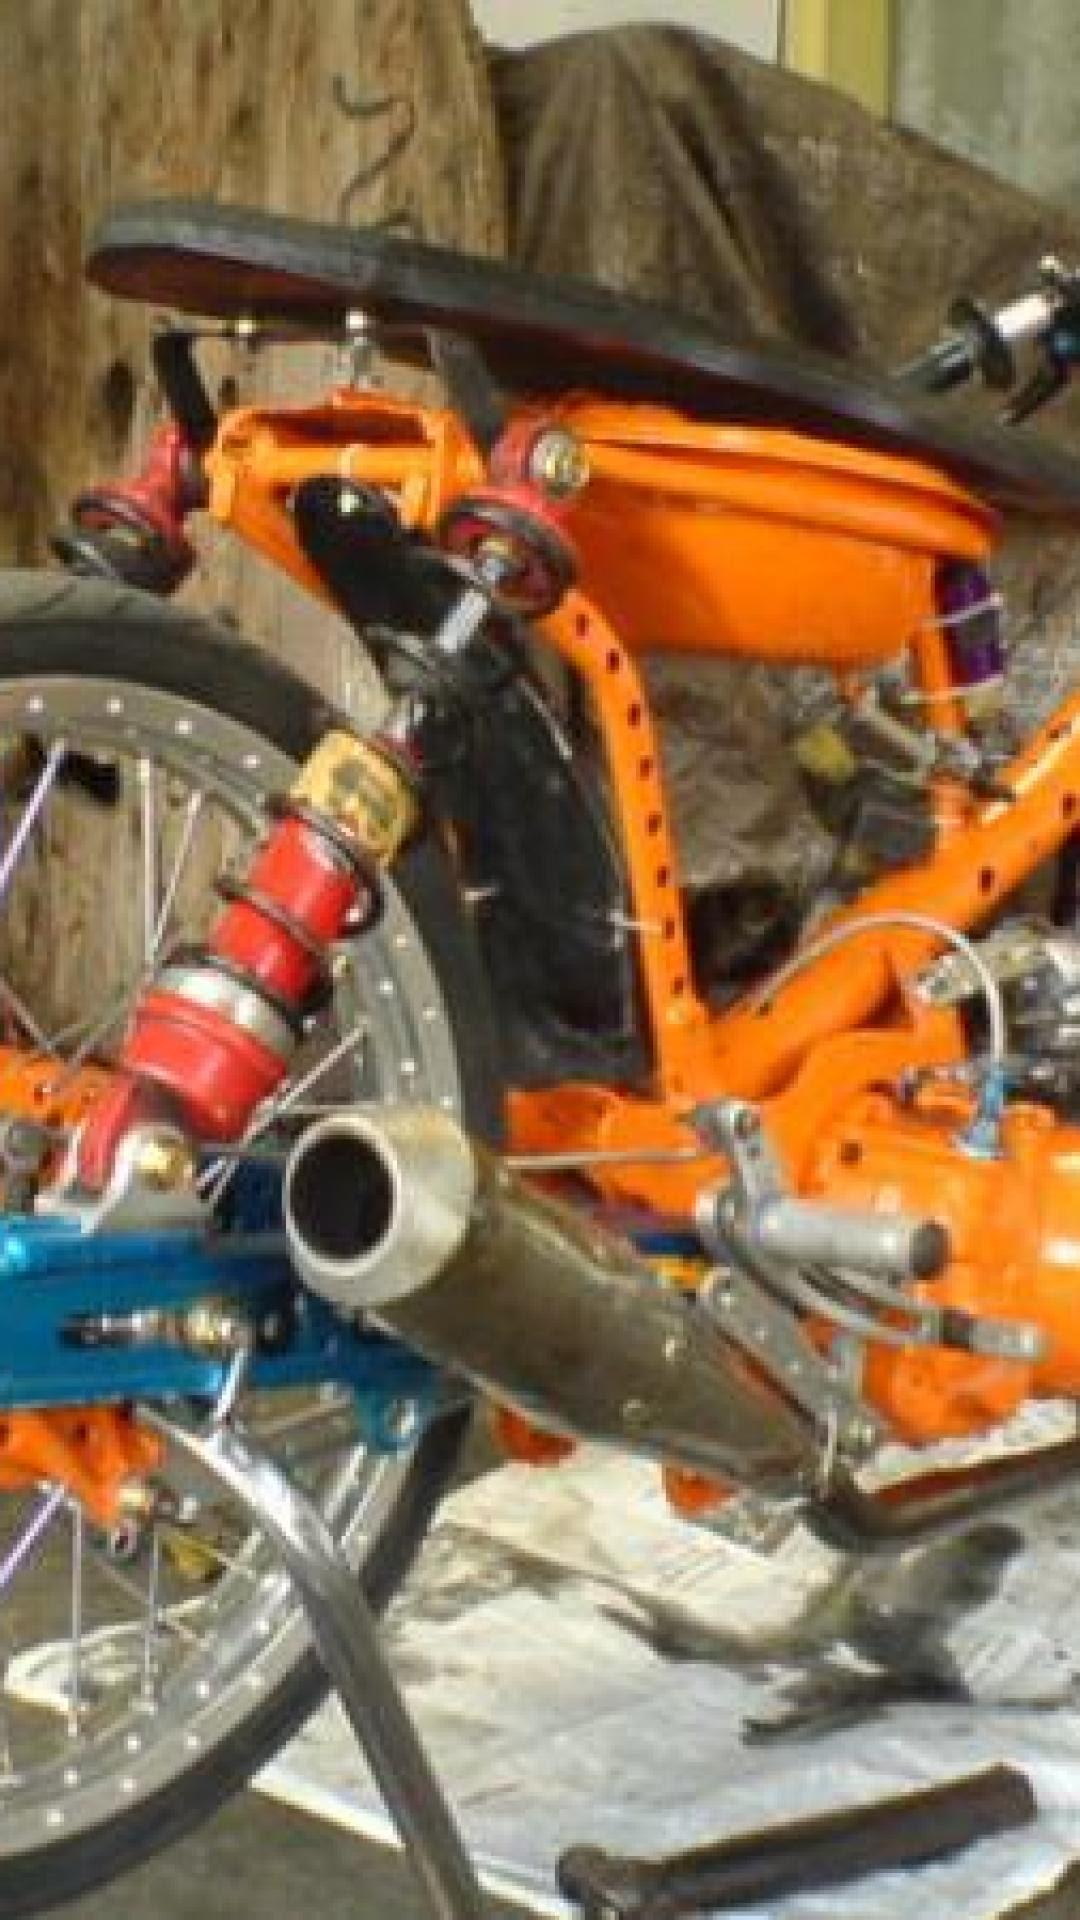 75 Modifikasi Motor Drag Honda Grand Terlengkap Gudeg Motor